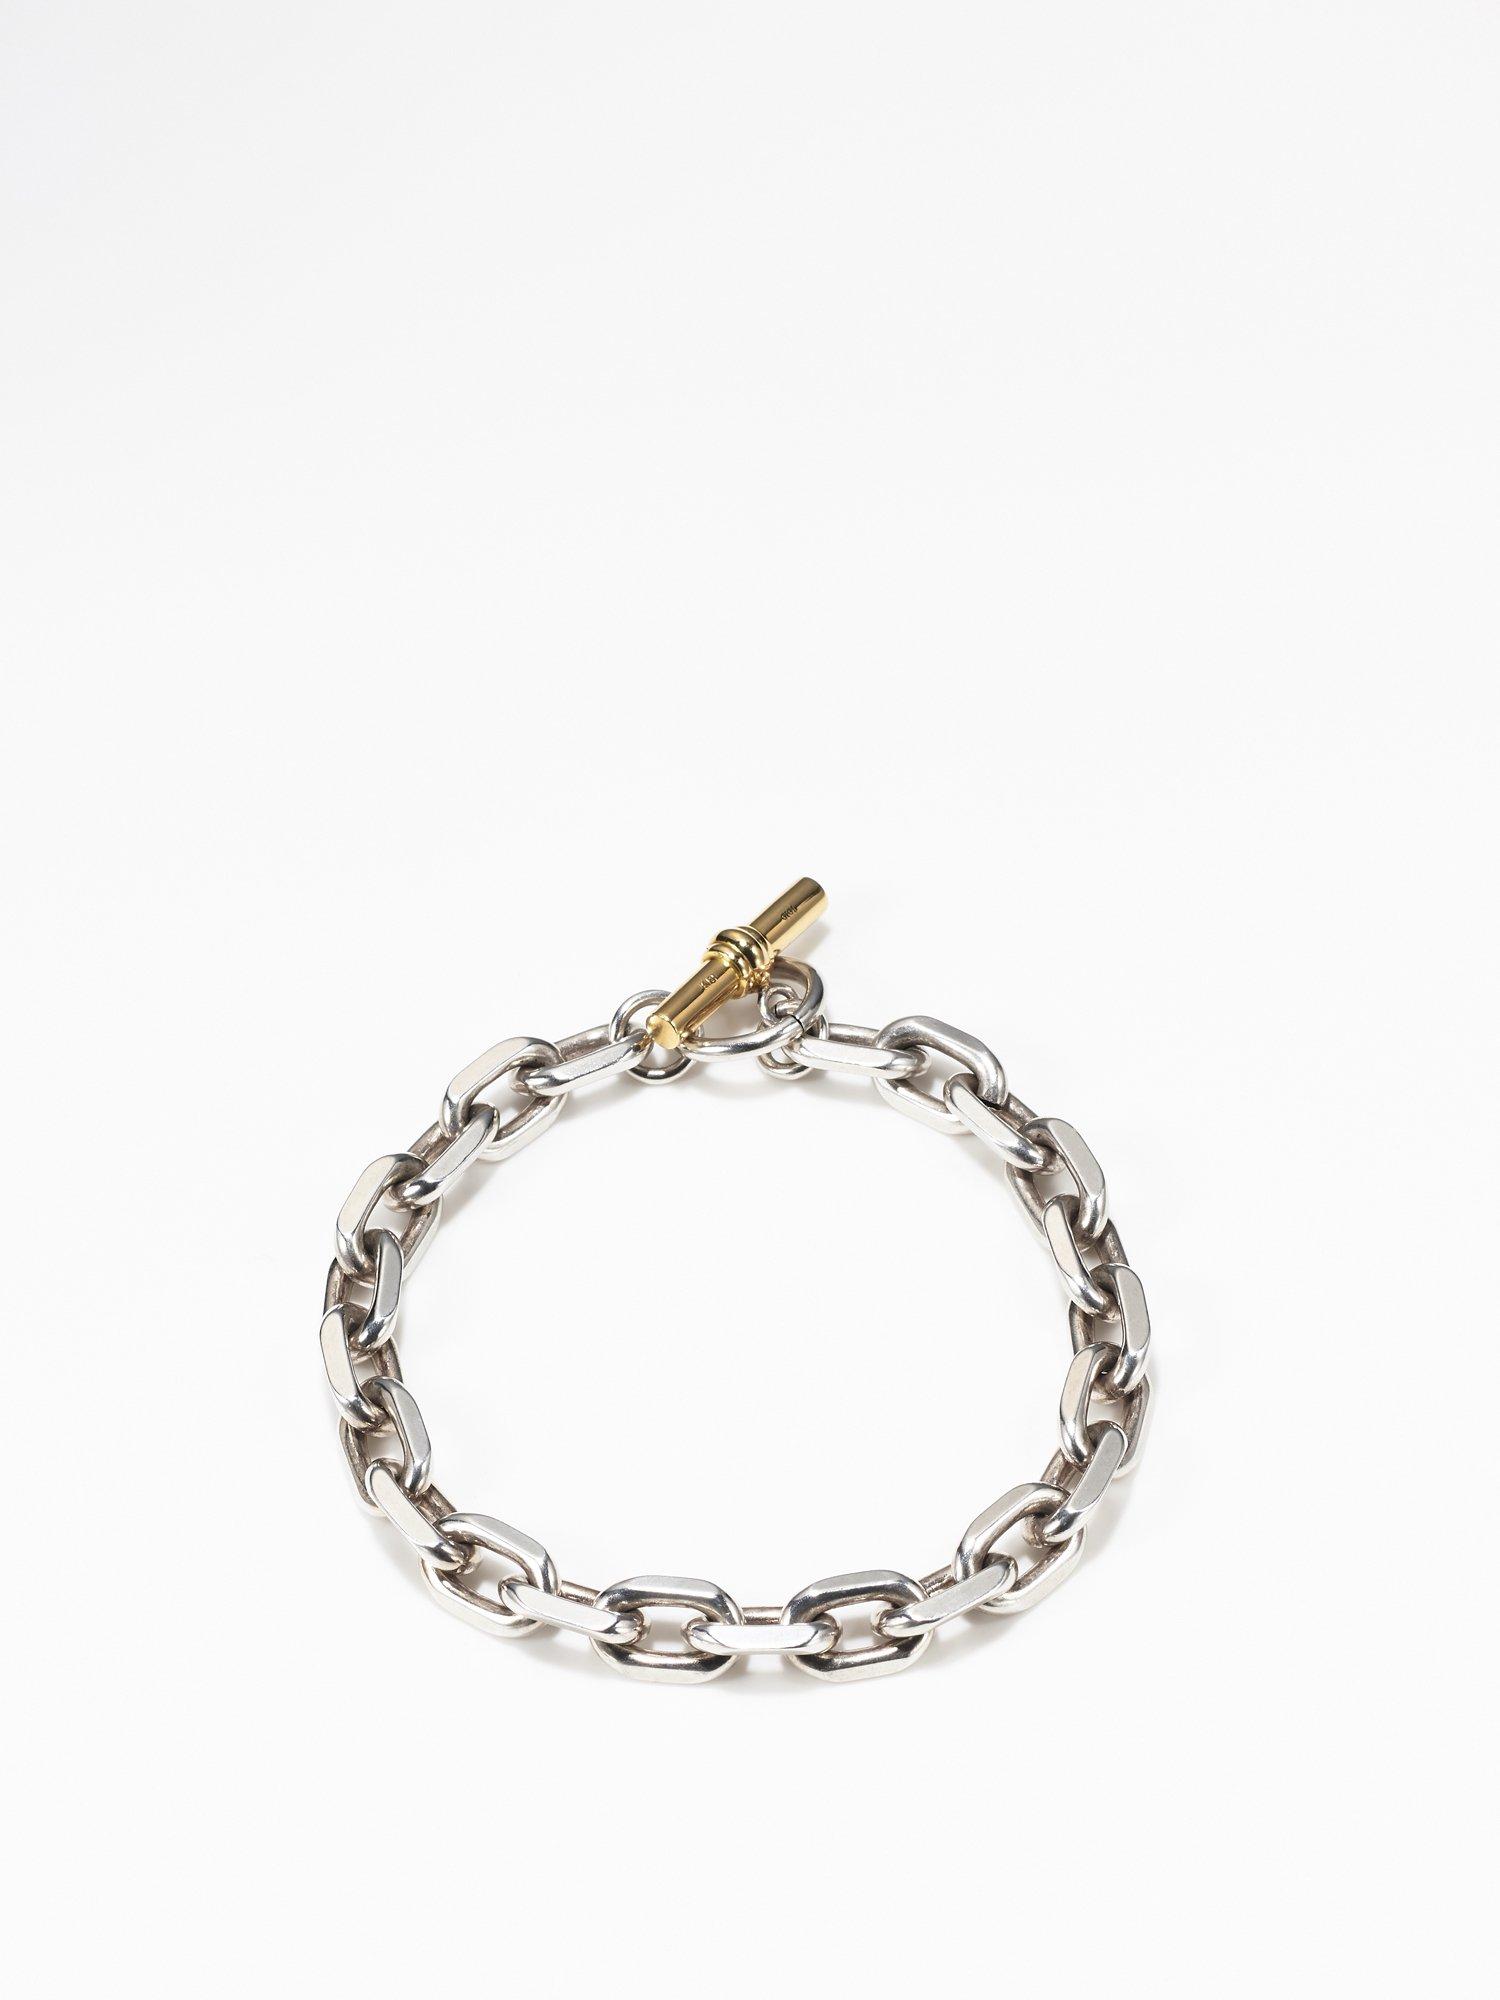 ARTEMIS / Artemis chain bracelet / 180mm / 在庫商品